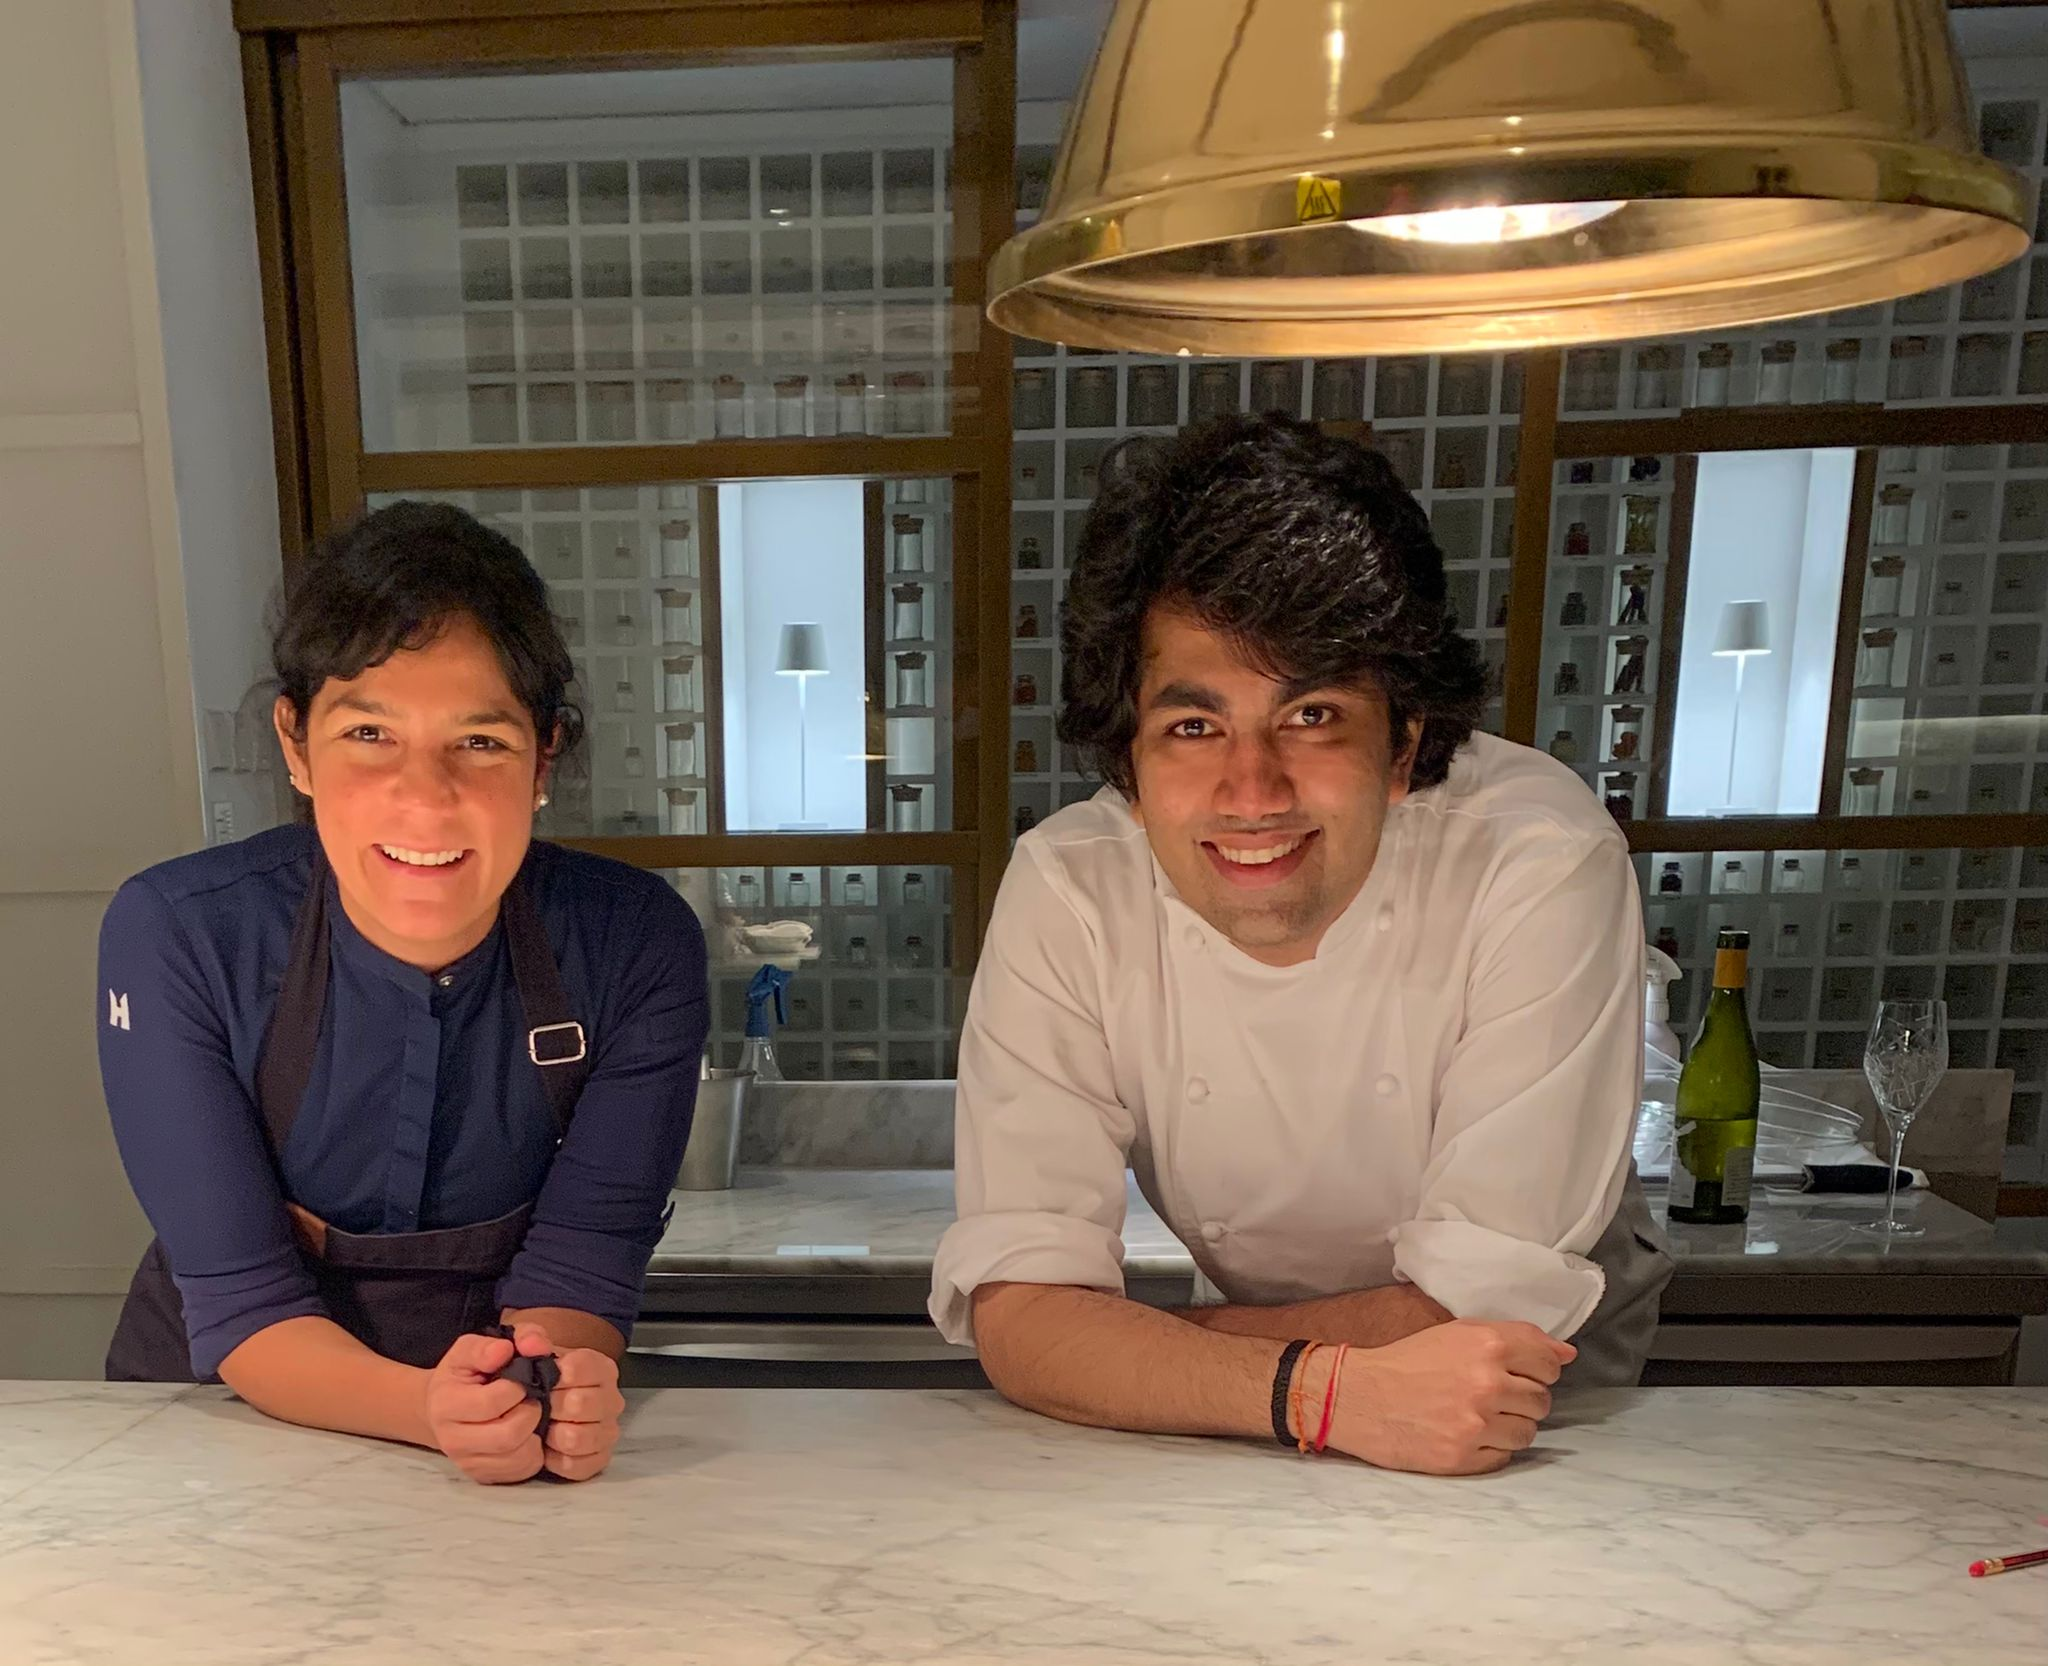 Manu Buffara e o chef Himanshu Saini, do restaurante indiano Tresind Studio.